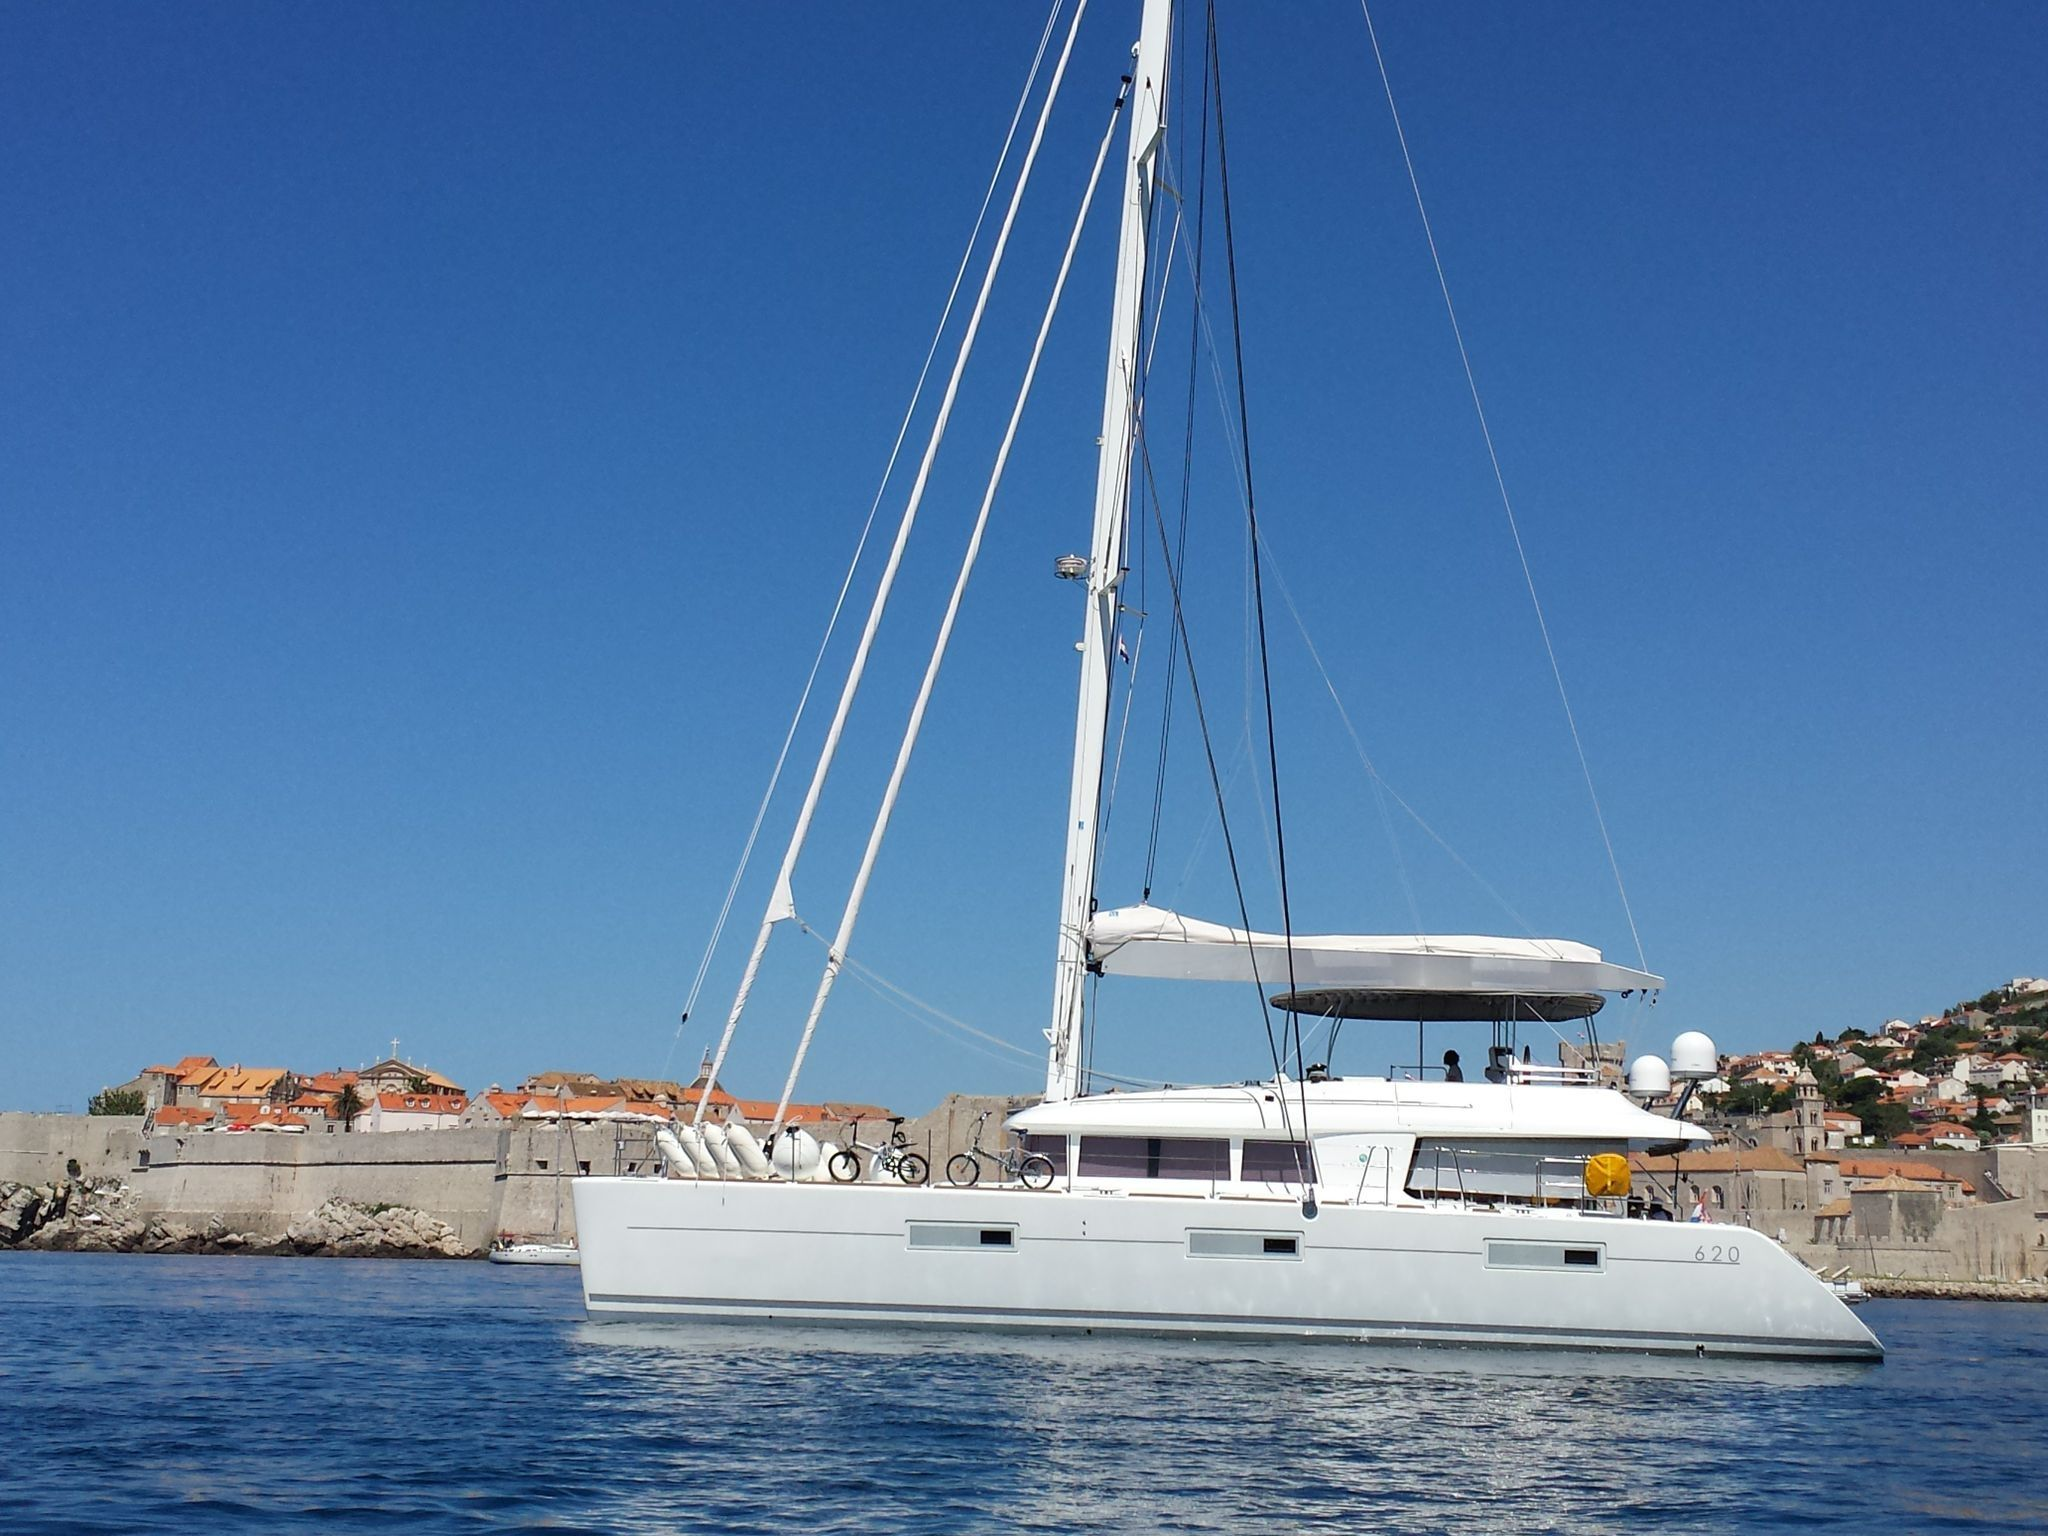 MY DESTINY - Lagoon 620 - 4 Cabins - Croatia - Tivat - Kotor - Dubrovnik - Split